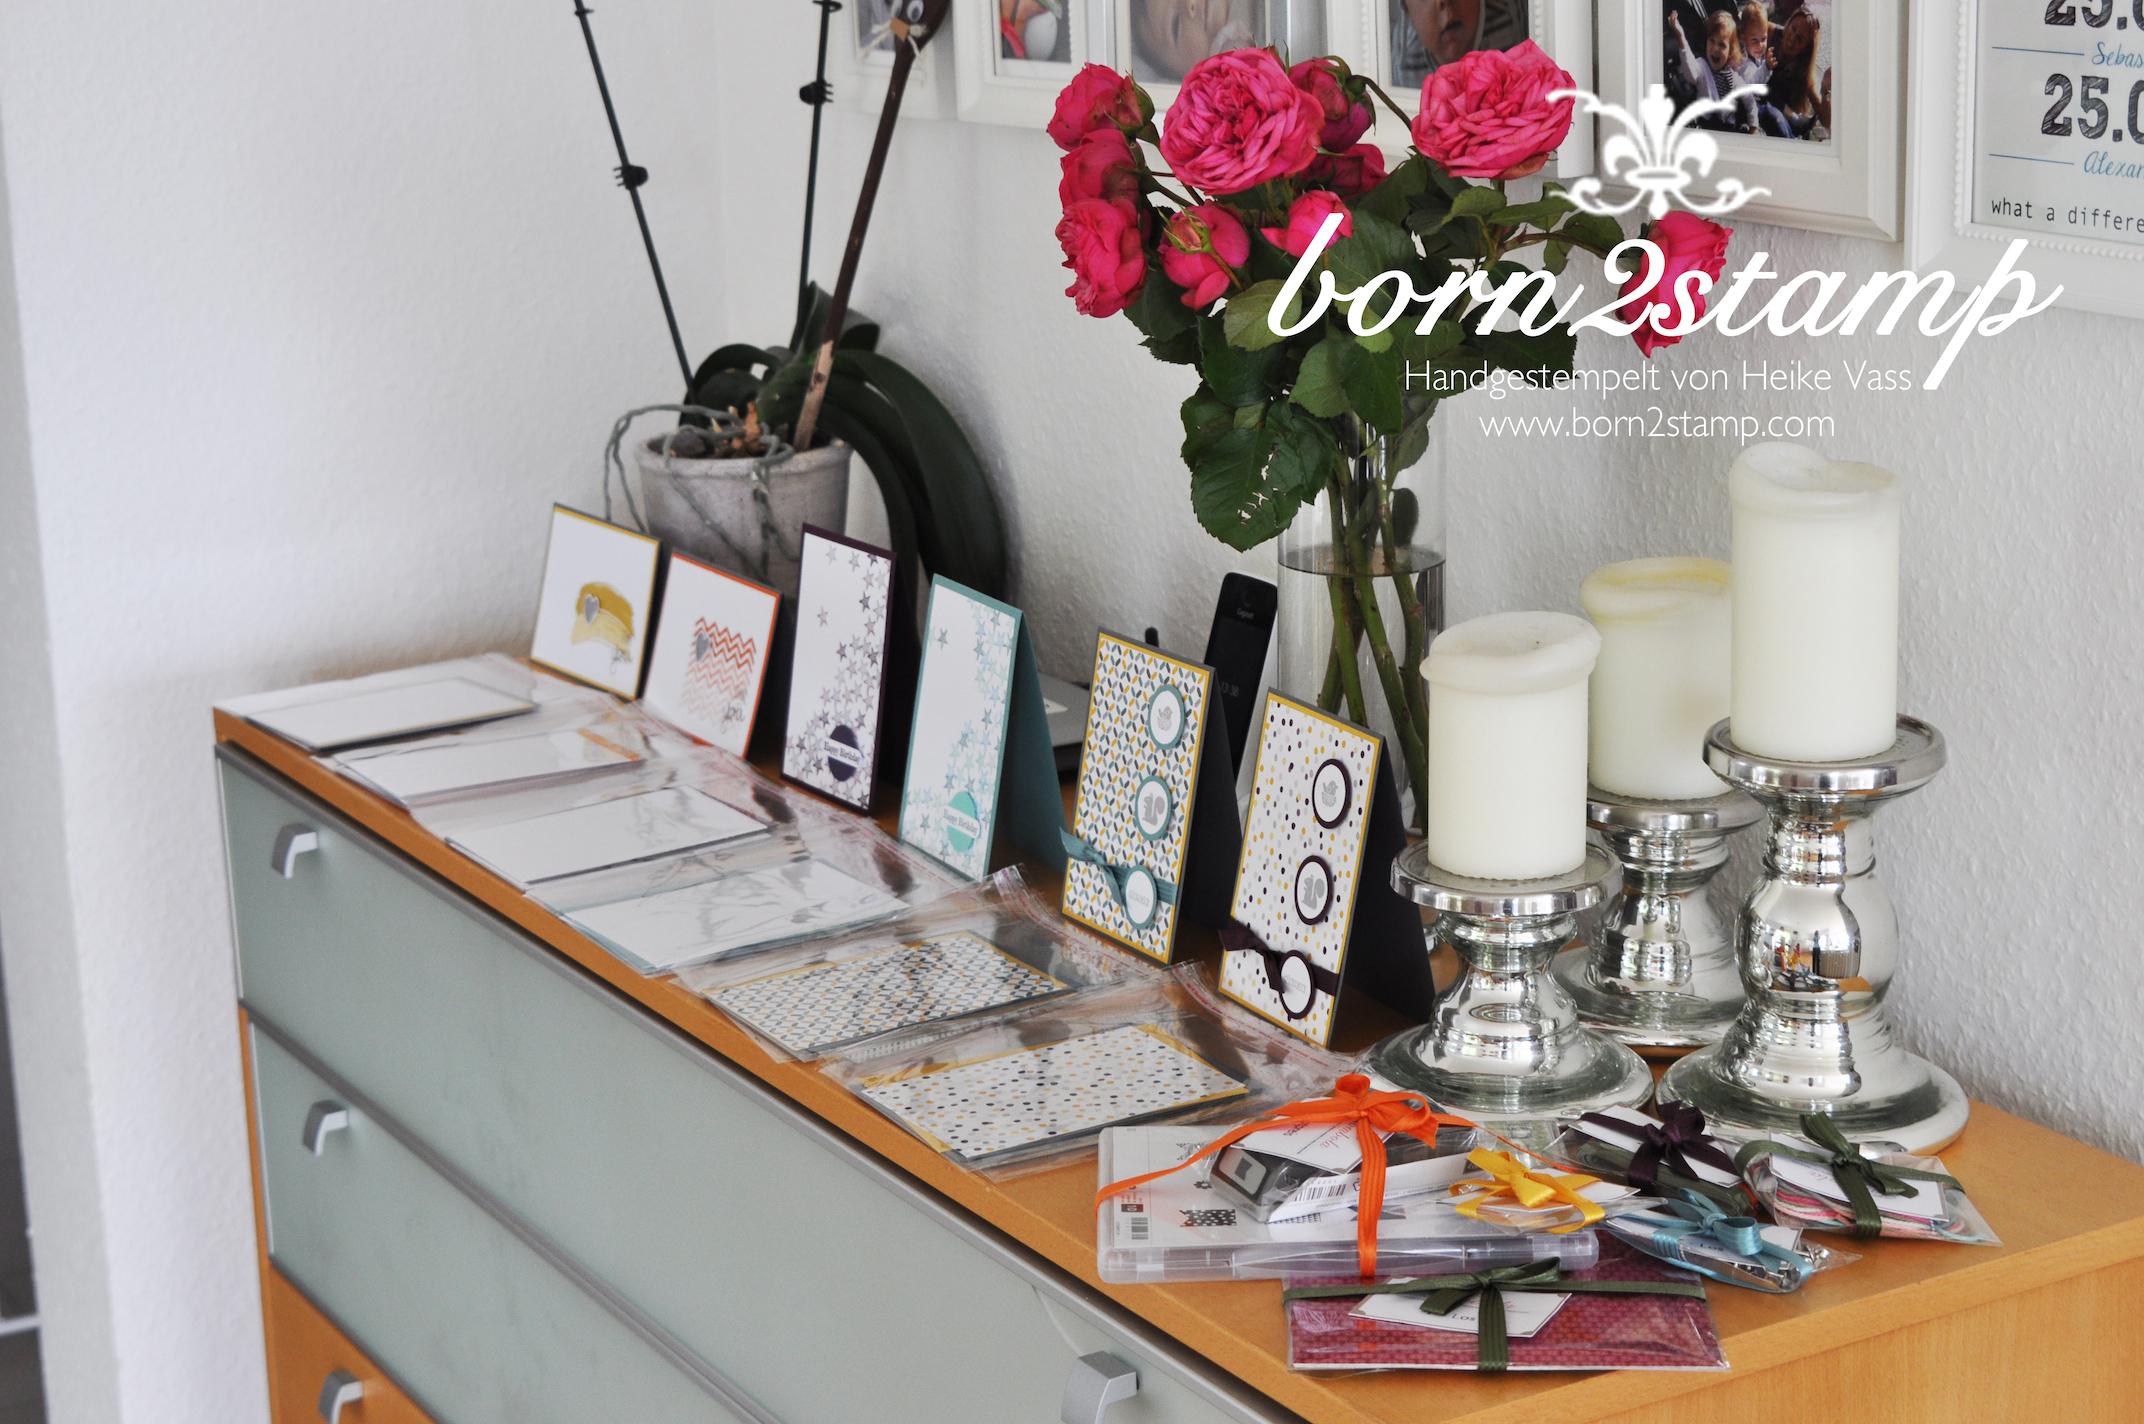 Katalogparty born2stamp Projektbuffet und Tombolagewinne